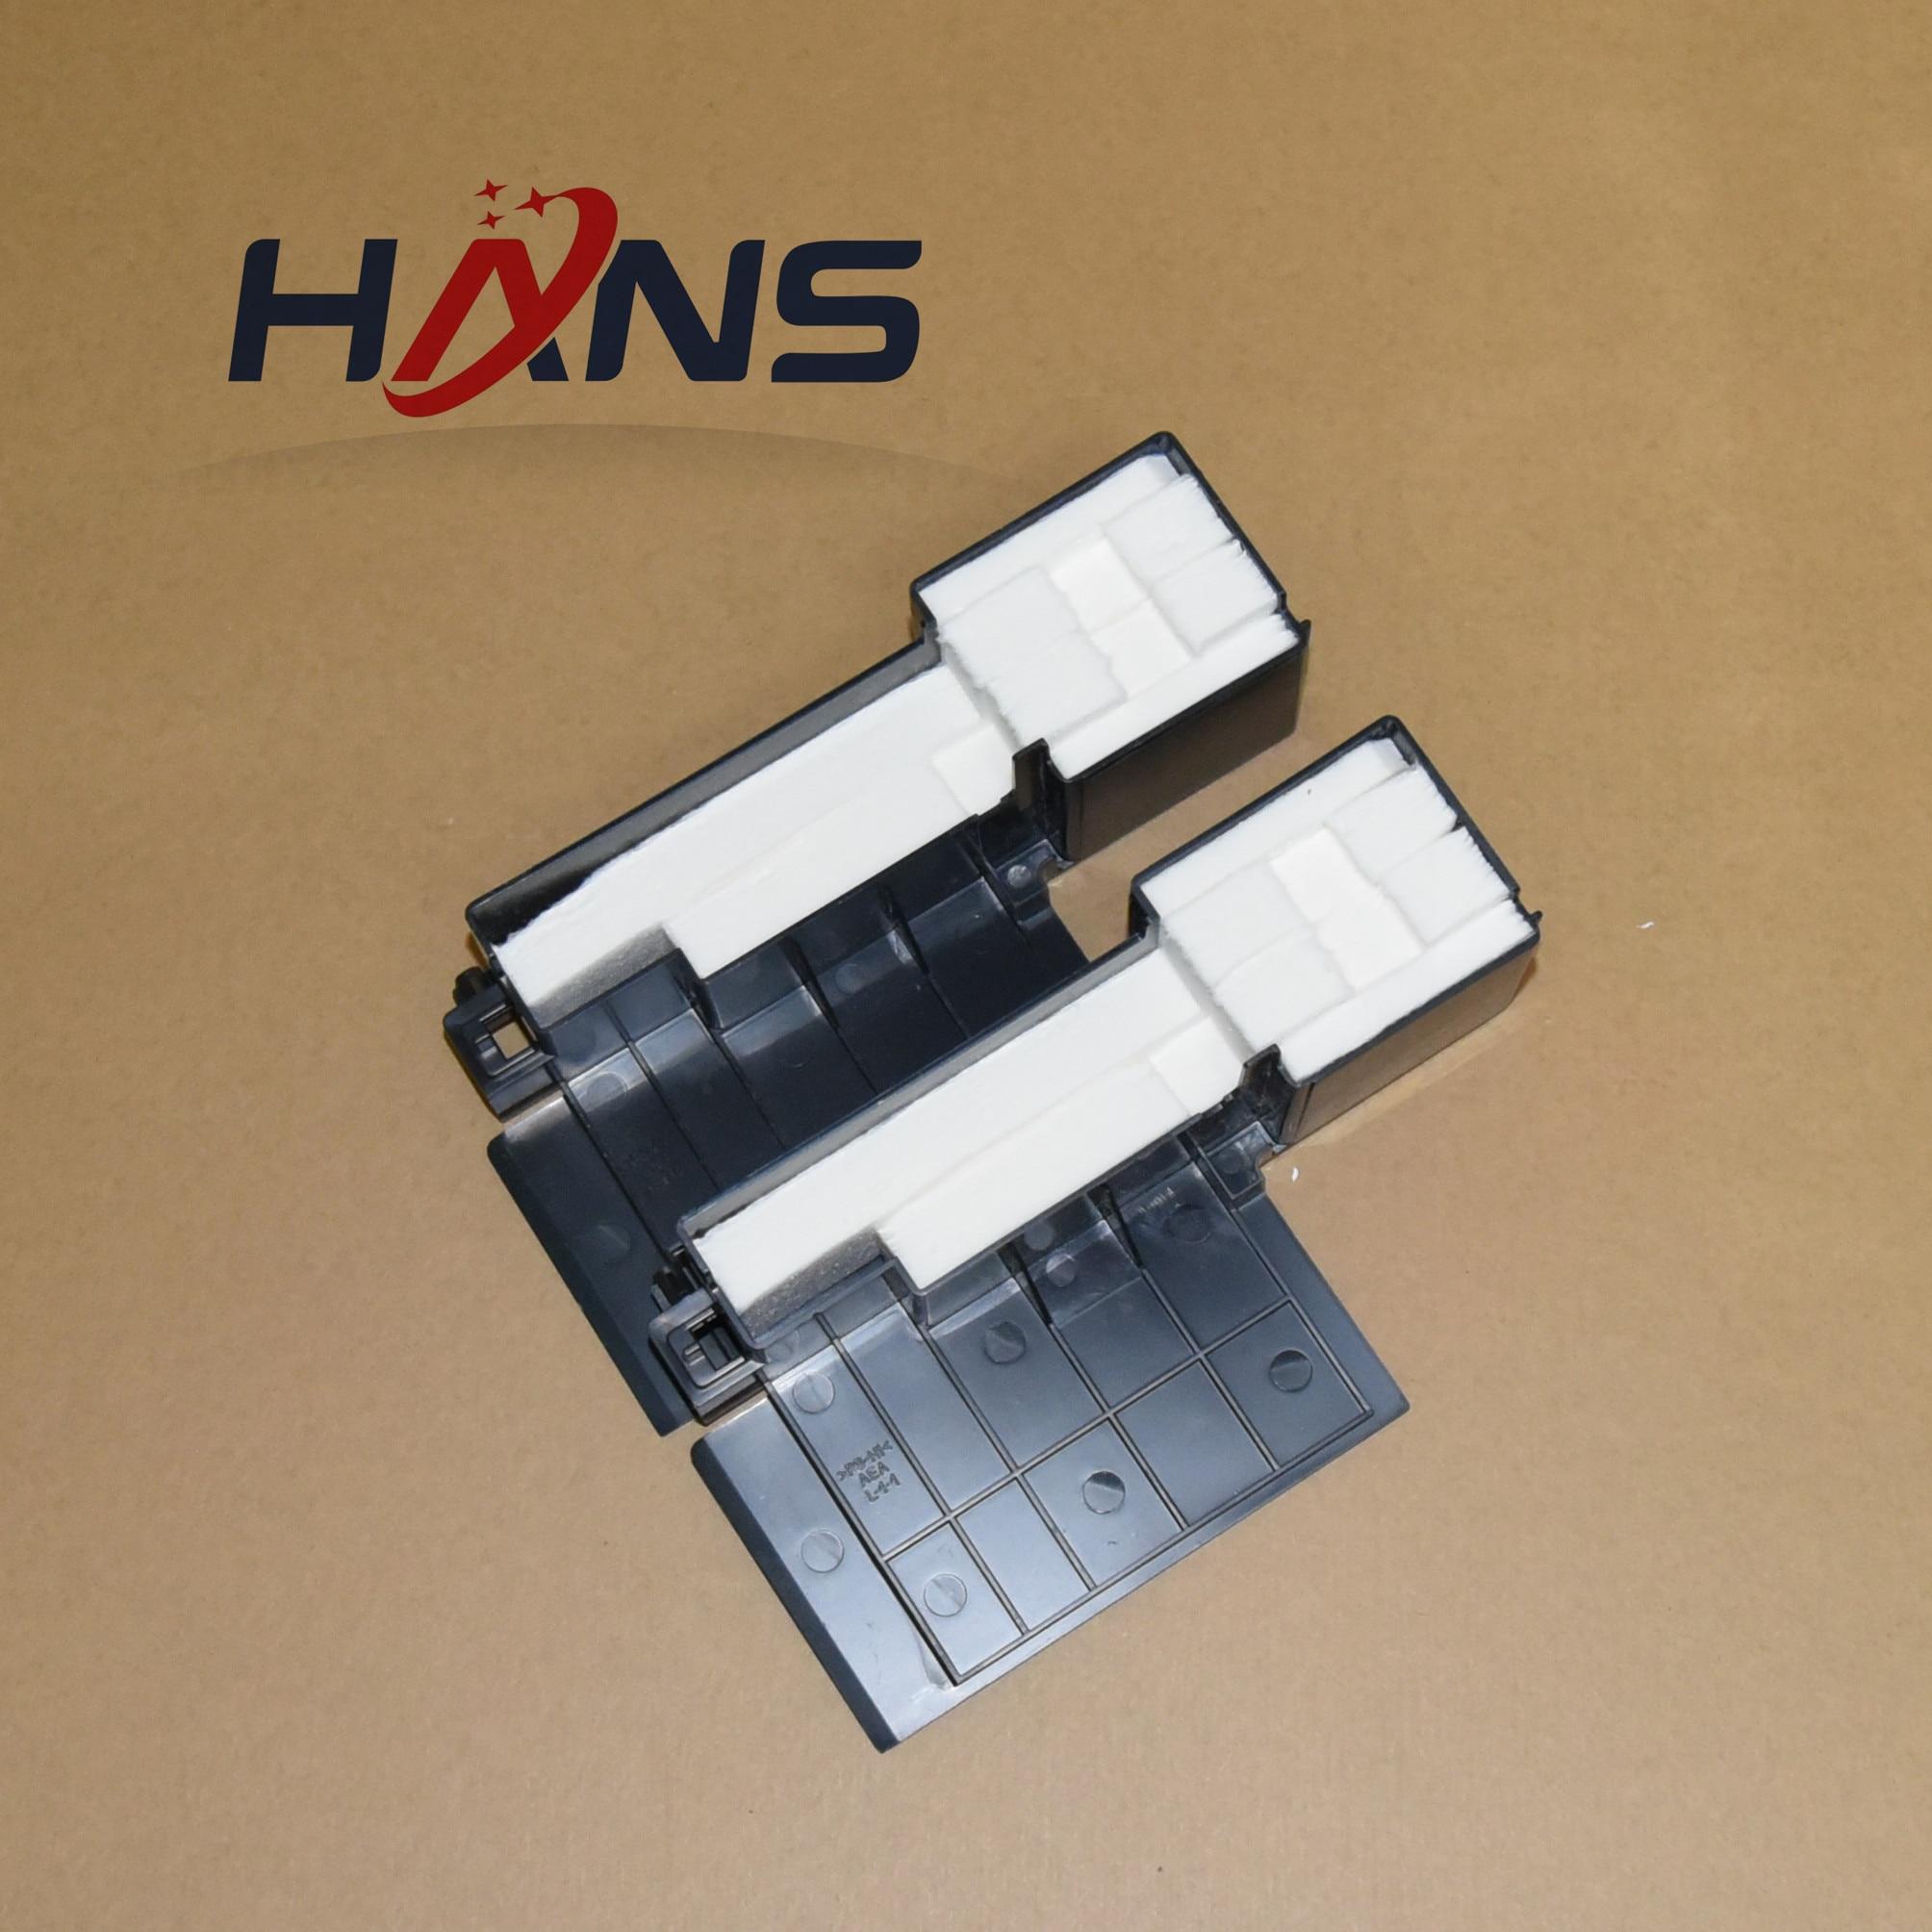 Image 3 - 16PCS Original L301 Waste Ink Tank Pad Sponge for Epson L300 L303 L350 L351 L353 L358 L355 L111 L110 L210 L211 ME101 ME303 ME401-in Printer Parts from Computer & Office